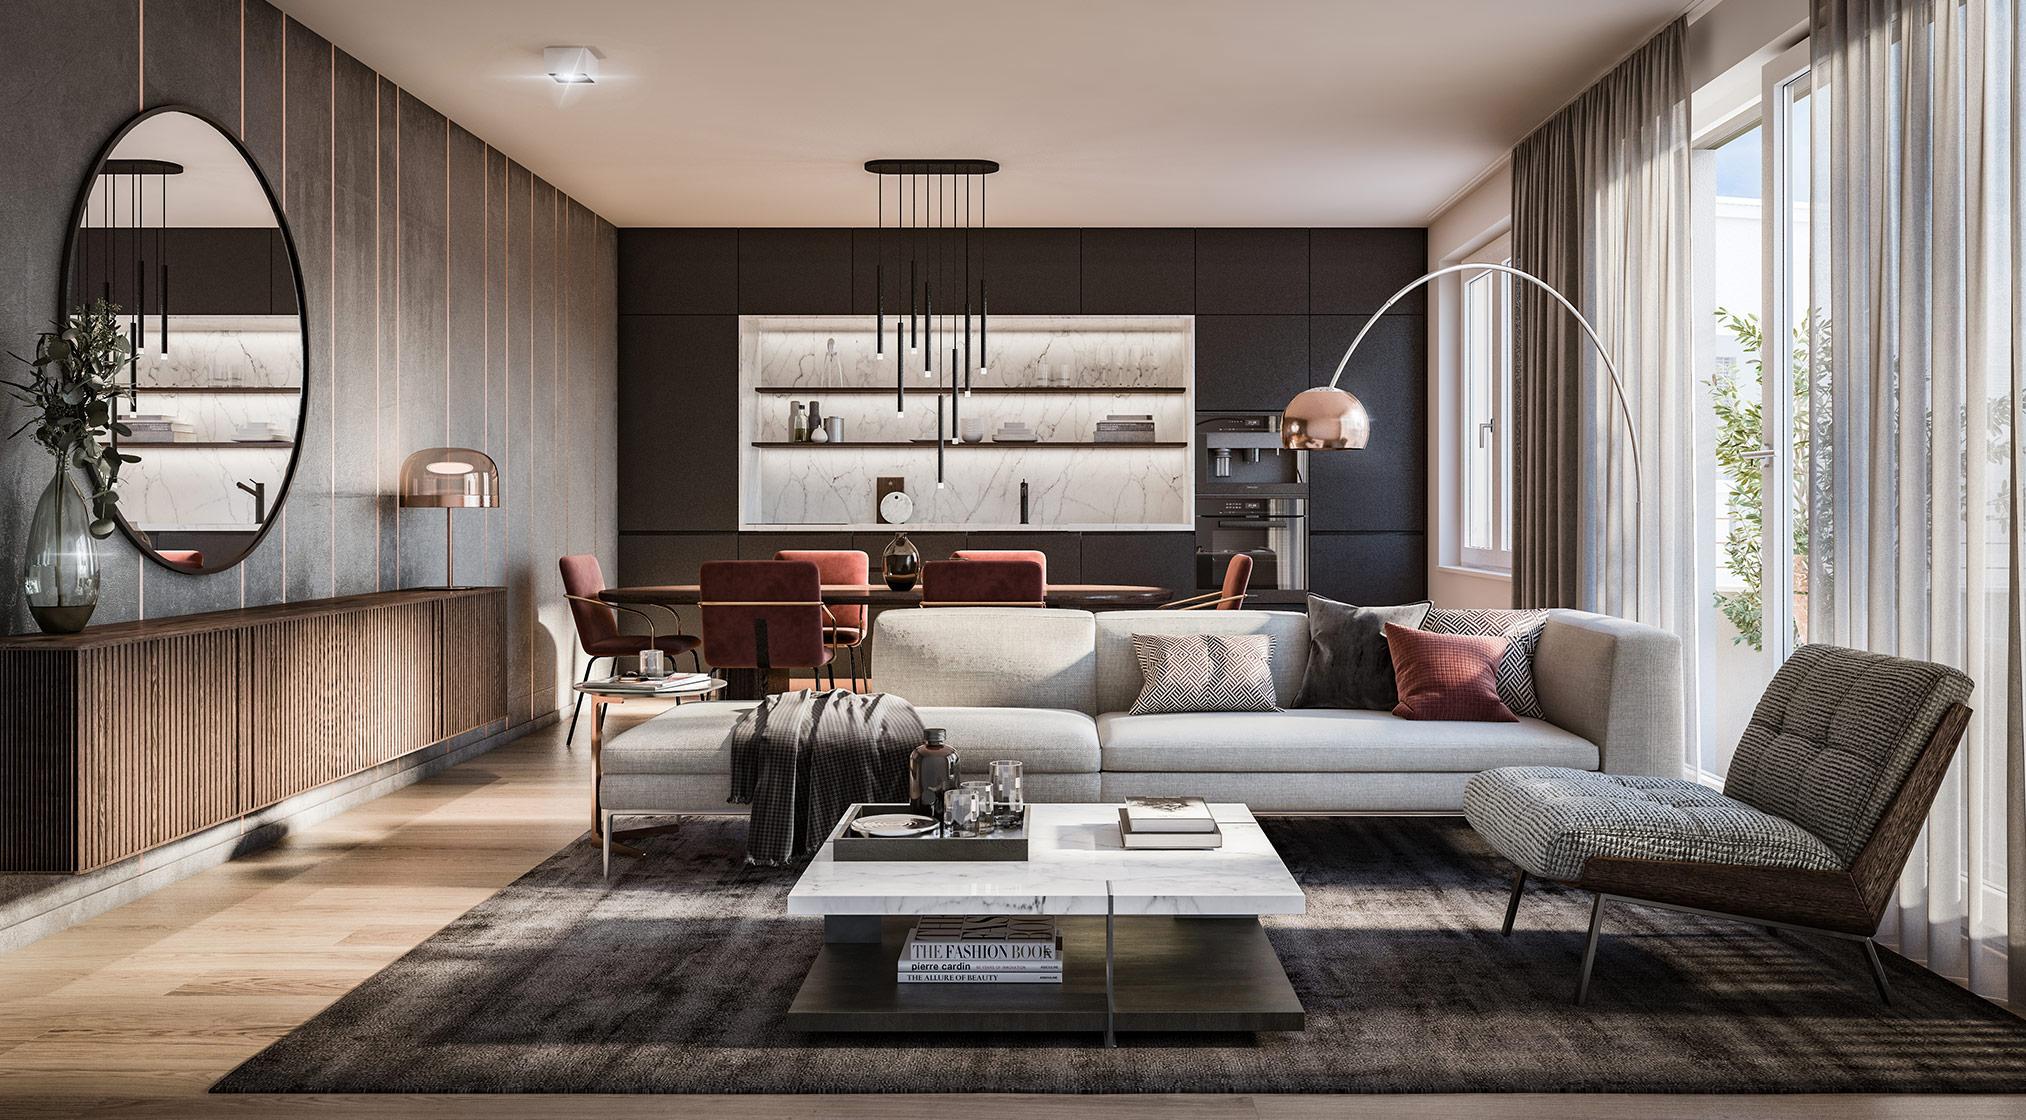 Immobilie Alexisquartier - Das Duett - Projektdetails - Illustration 3